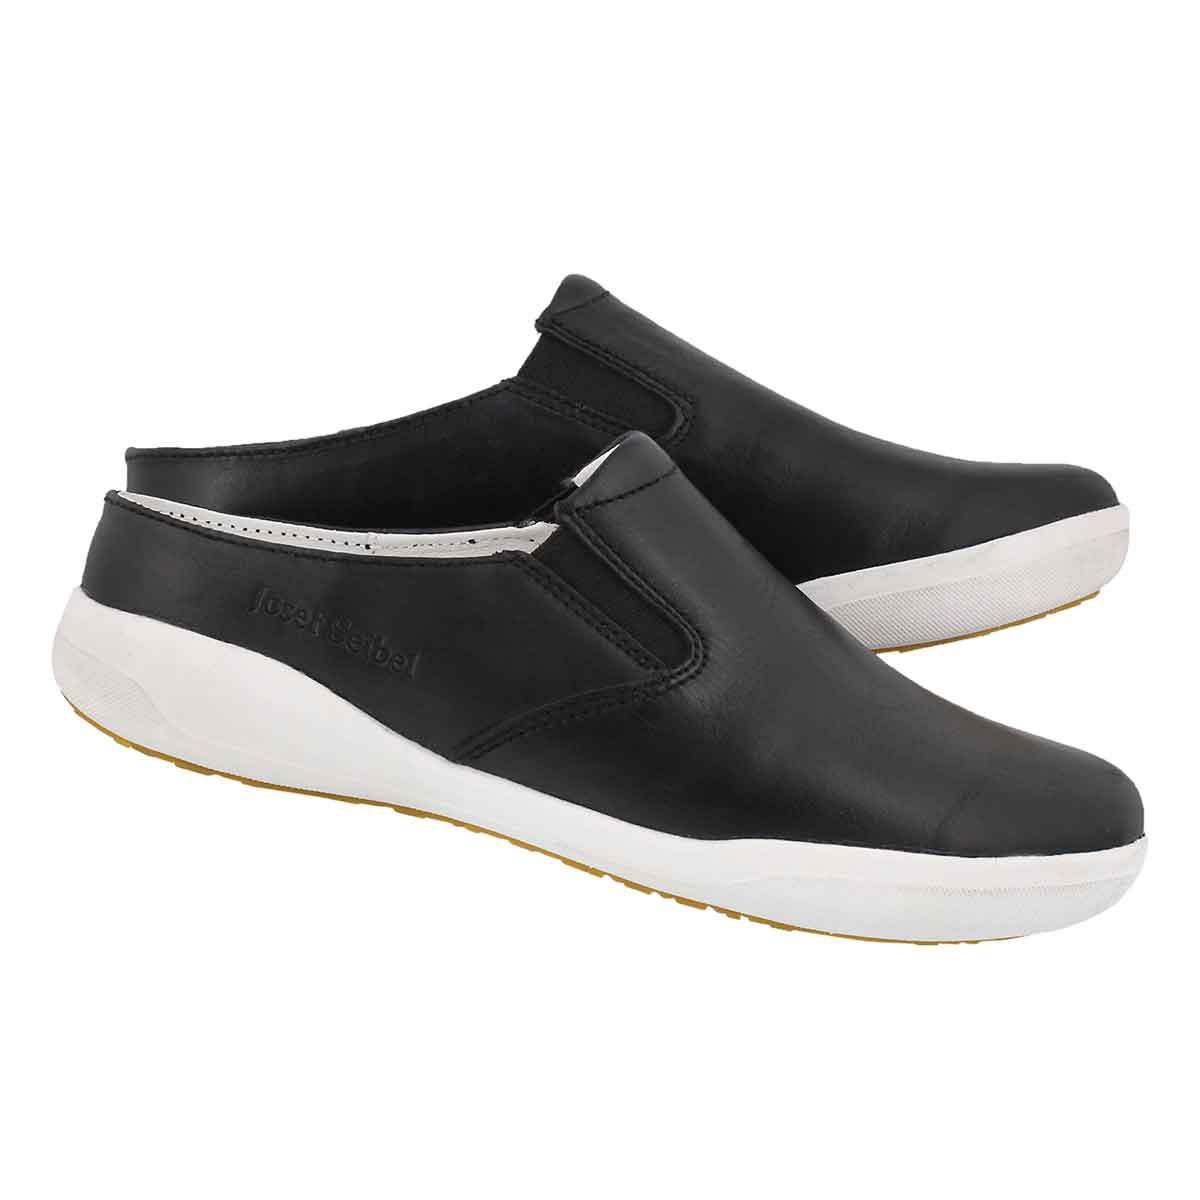 Lds Sina 35 black slip on shoe